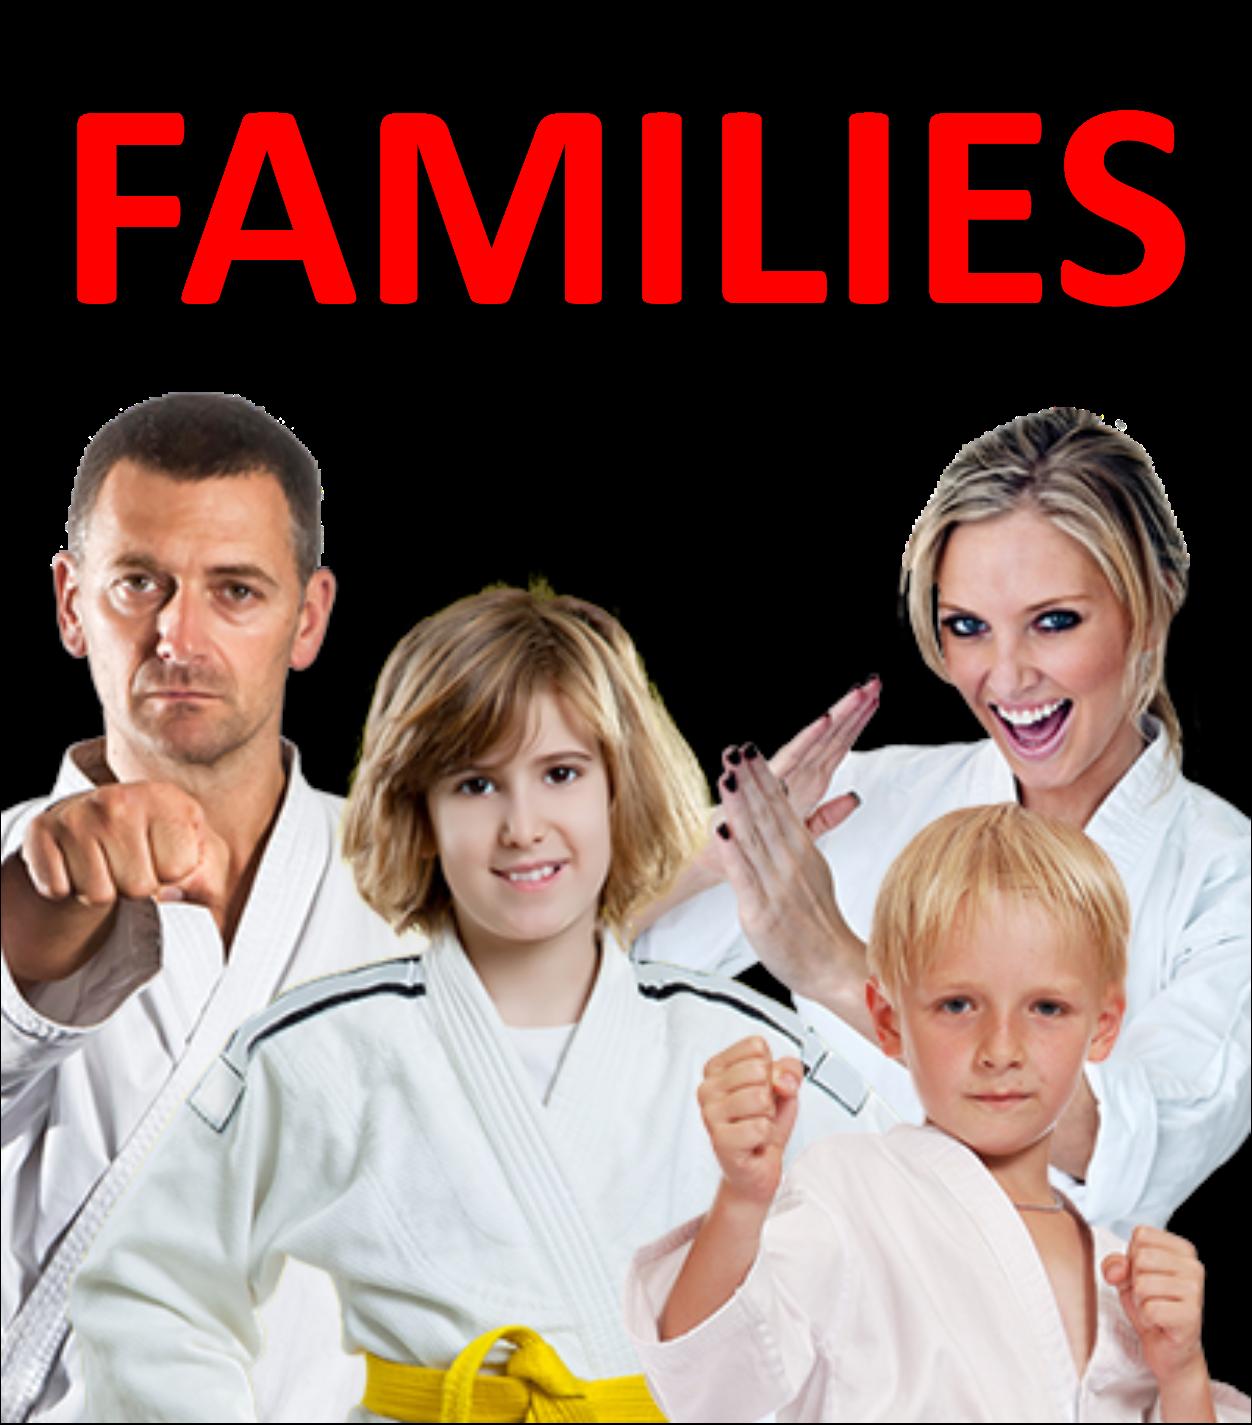 FAMILIES PROGRAM